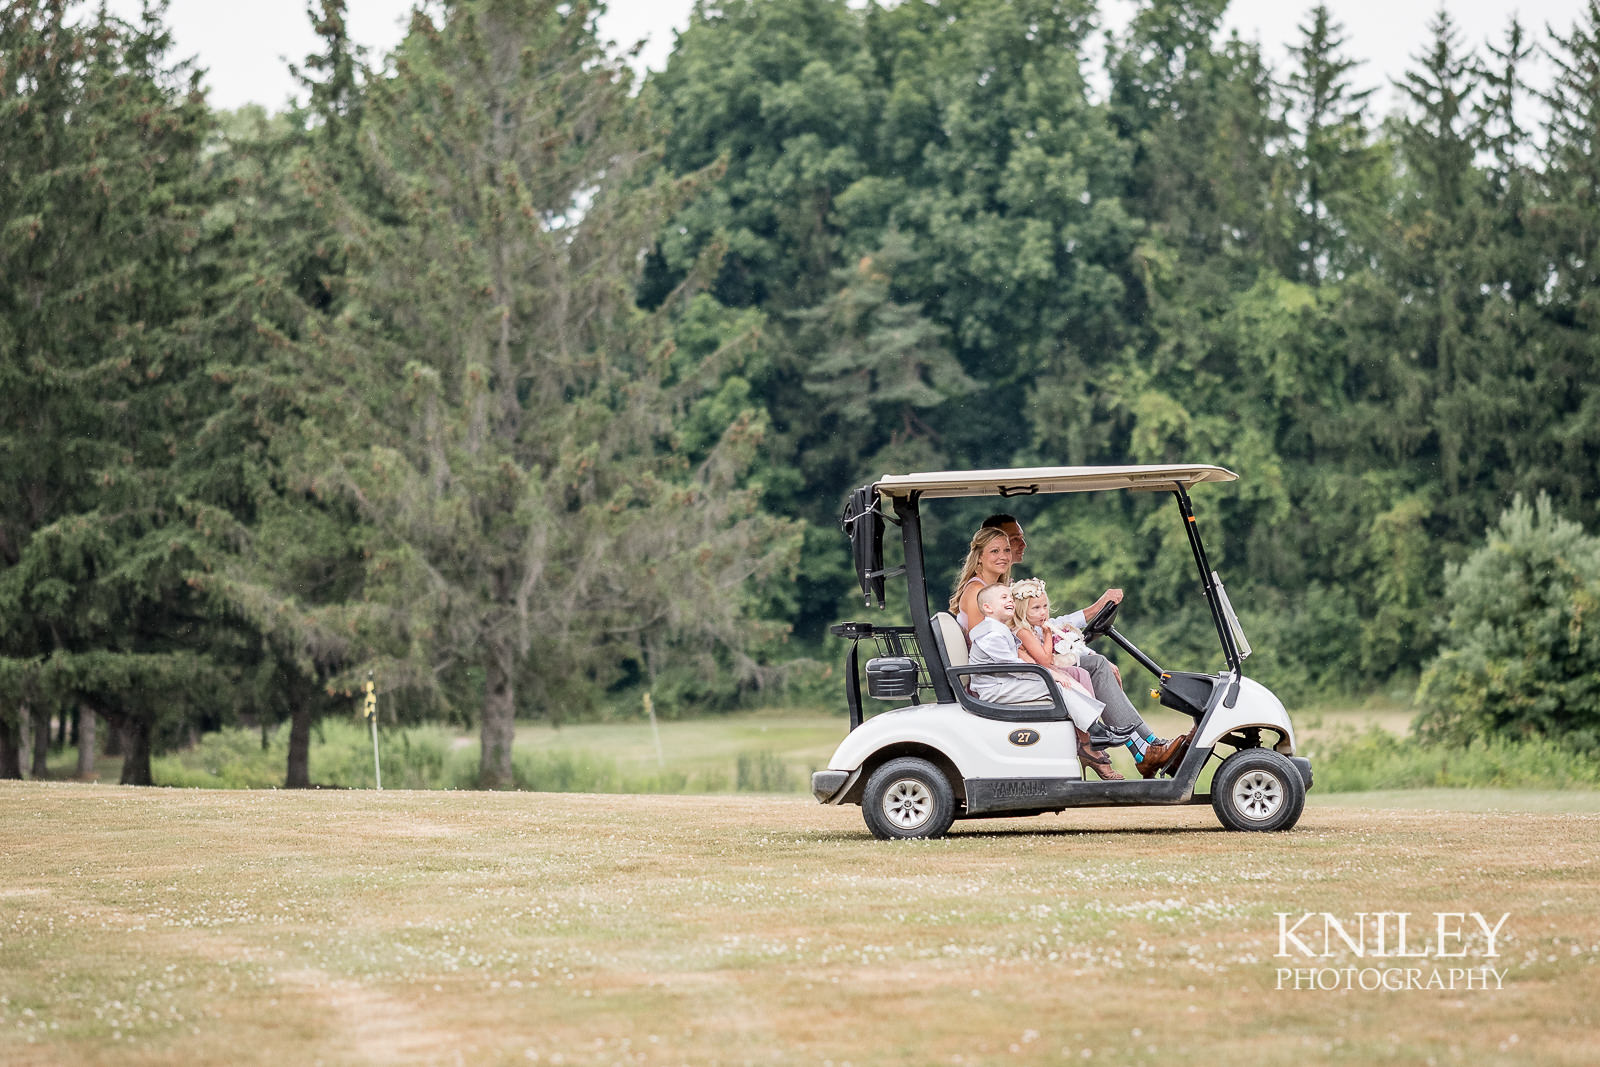 036 - Ontario Golf Club Wedding Pictures - XT2A6609.jpg